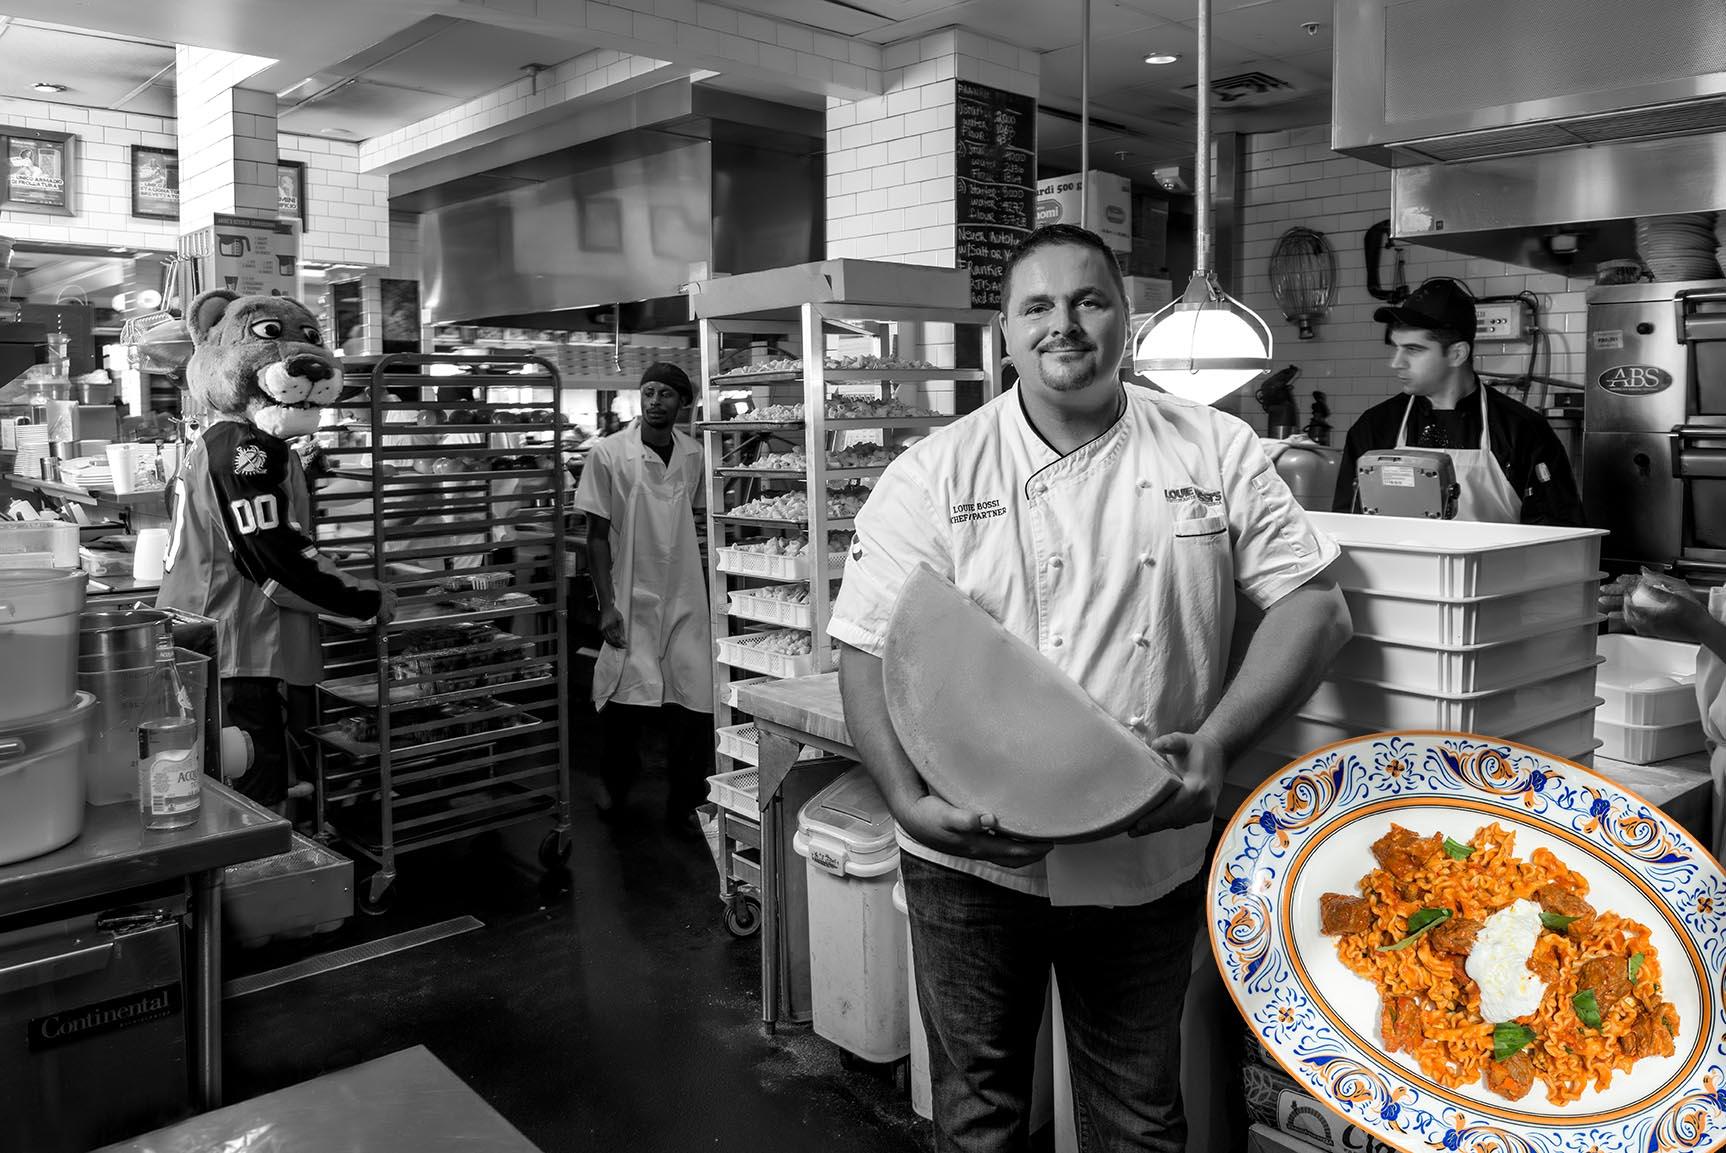 Venice-magazine-summer-issue-florida-panthers-guest-chef-program-on-the-prowl-Nan-Kavanaugh-Felipe-Cuevas- Richard-Adler-Anthony-Casacci-Nicole-Votano-Aaron-Michaels-Chef-Louie-Bossi- Chef-Laurent-Tasic